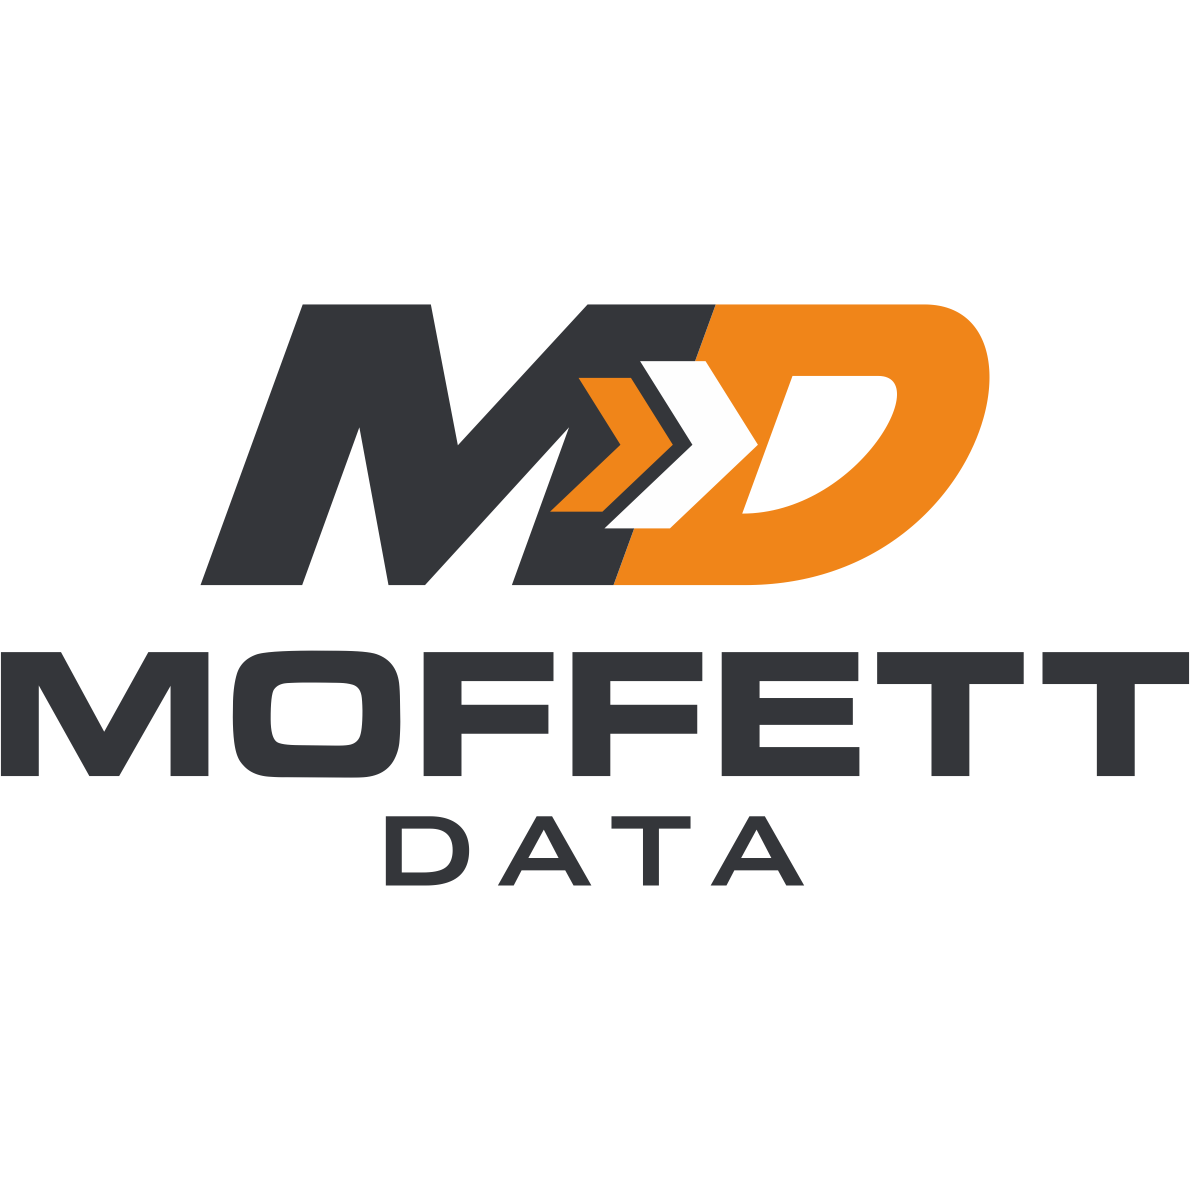 Moffett Data, Inc image 1